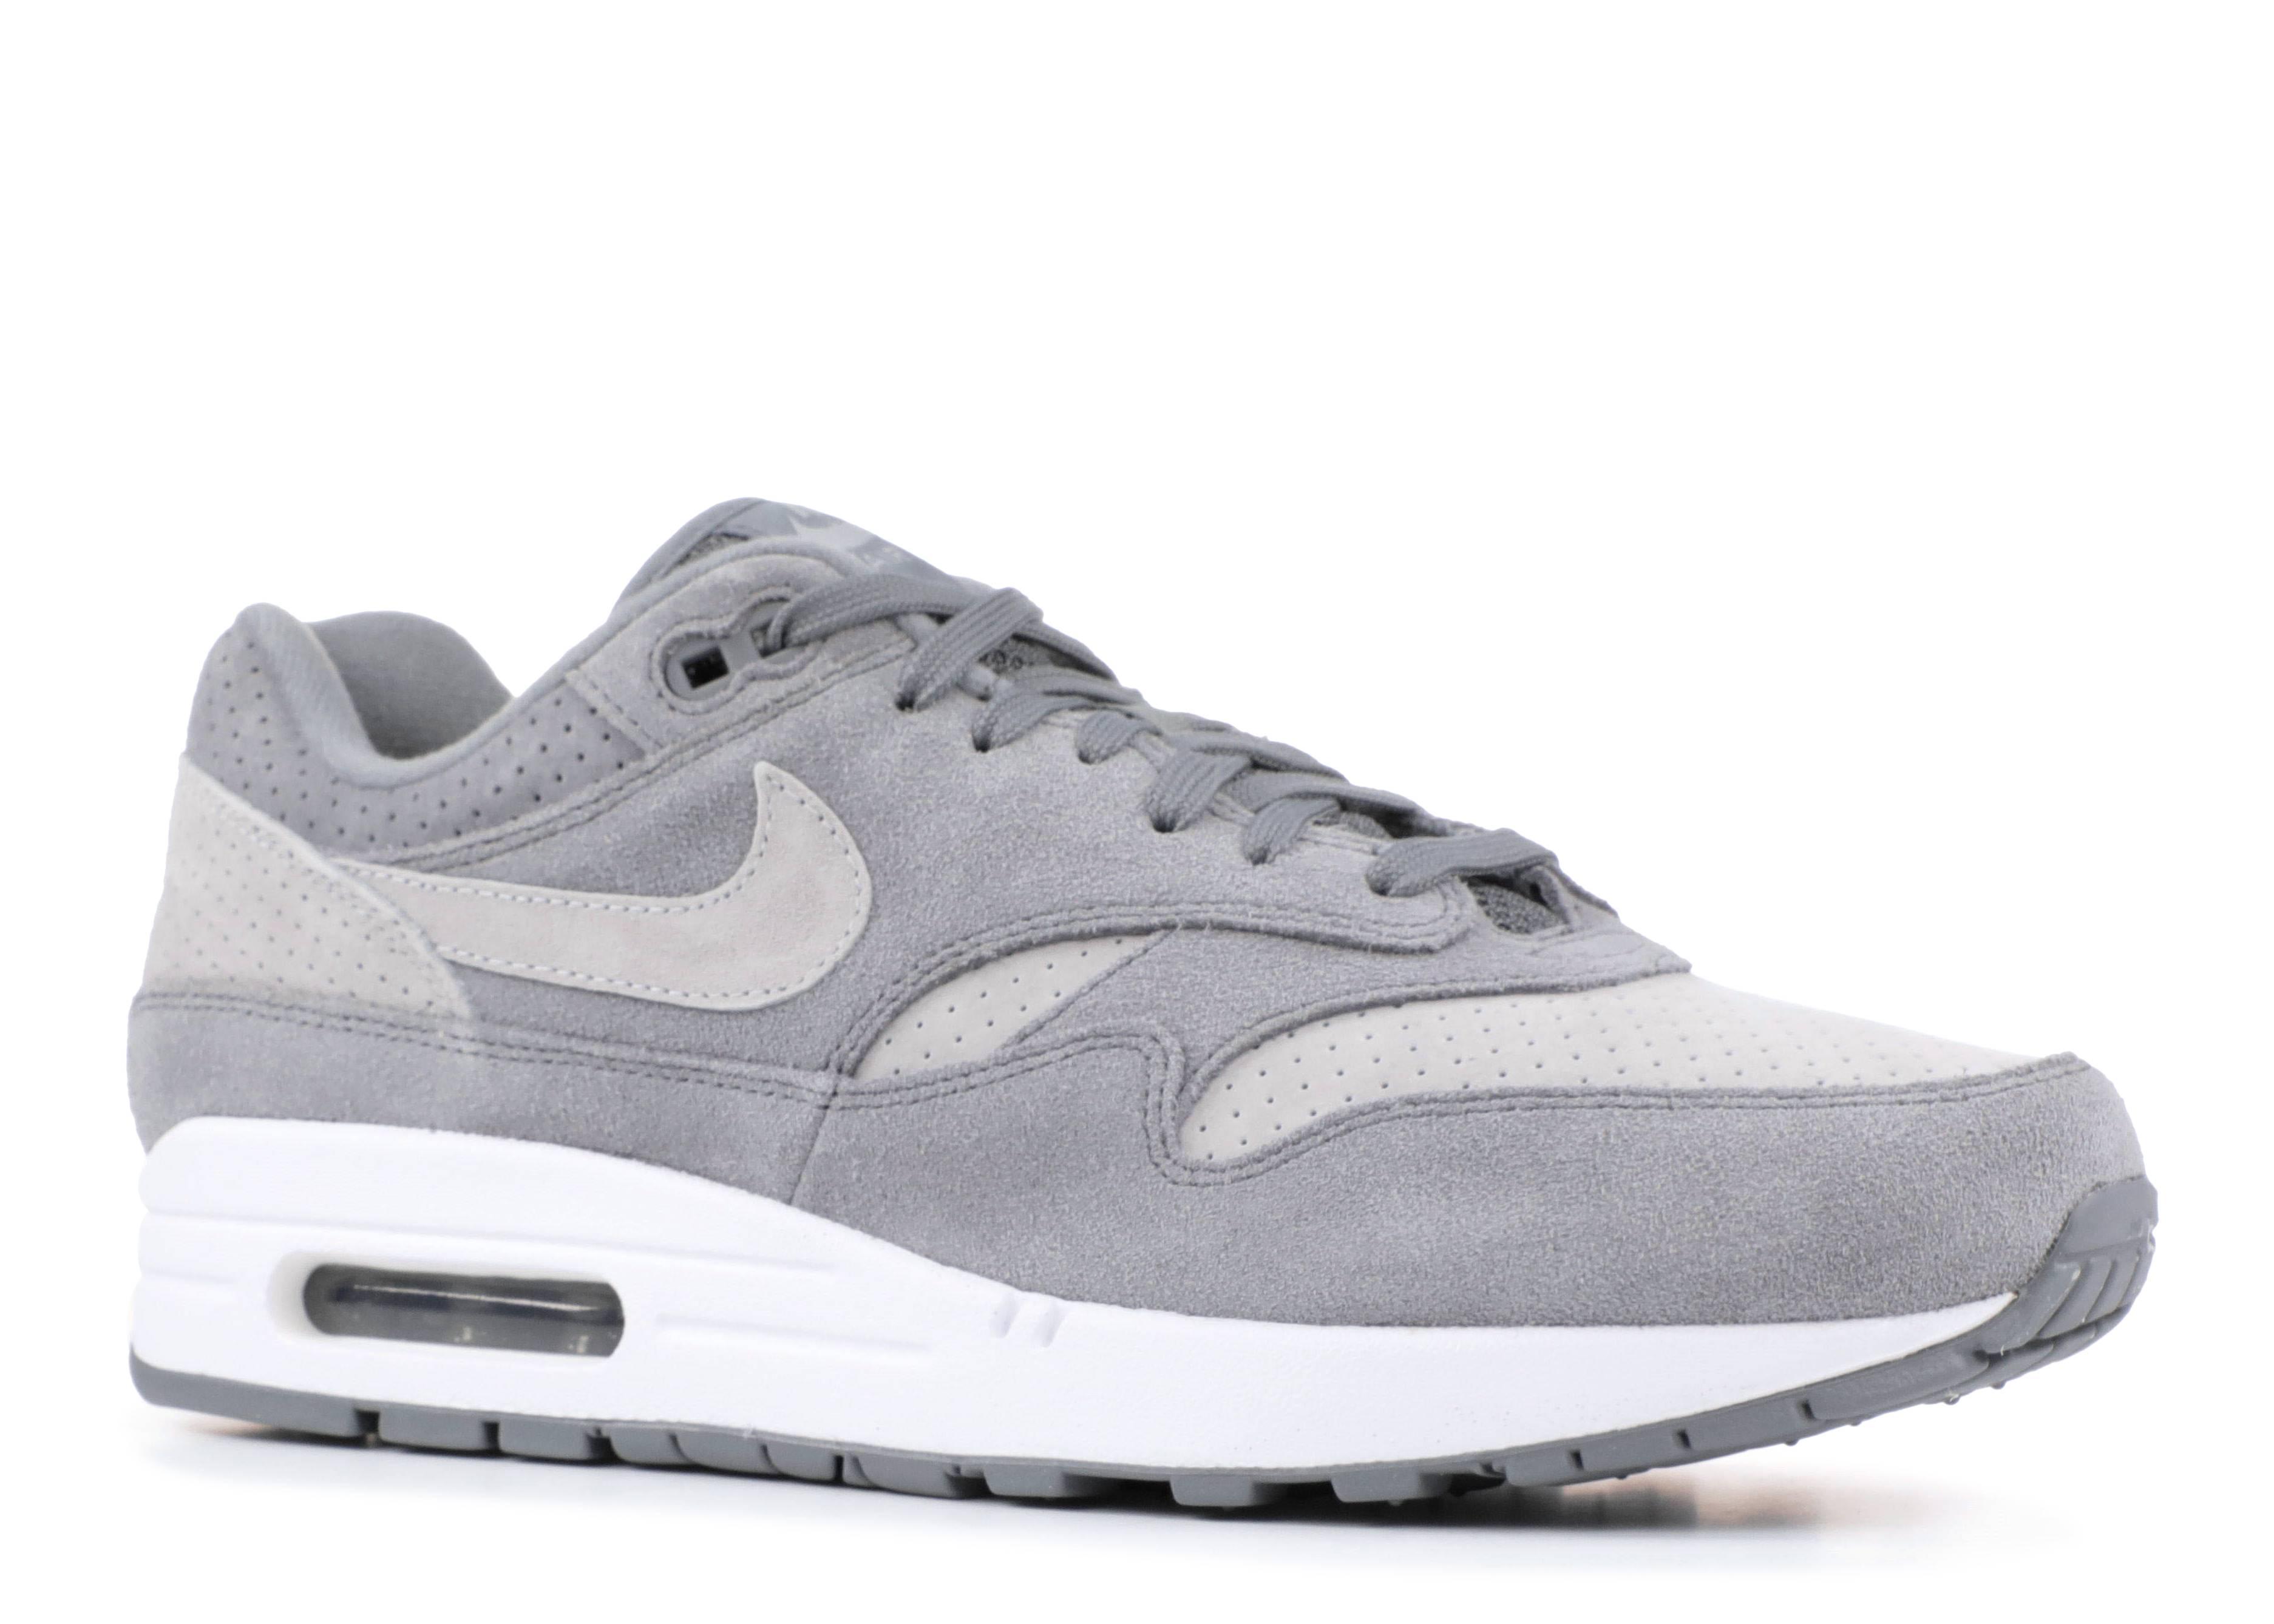 Nike Air Max 1 Premium Grey 875844 005 NOIRFONCE